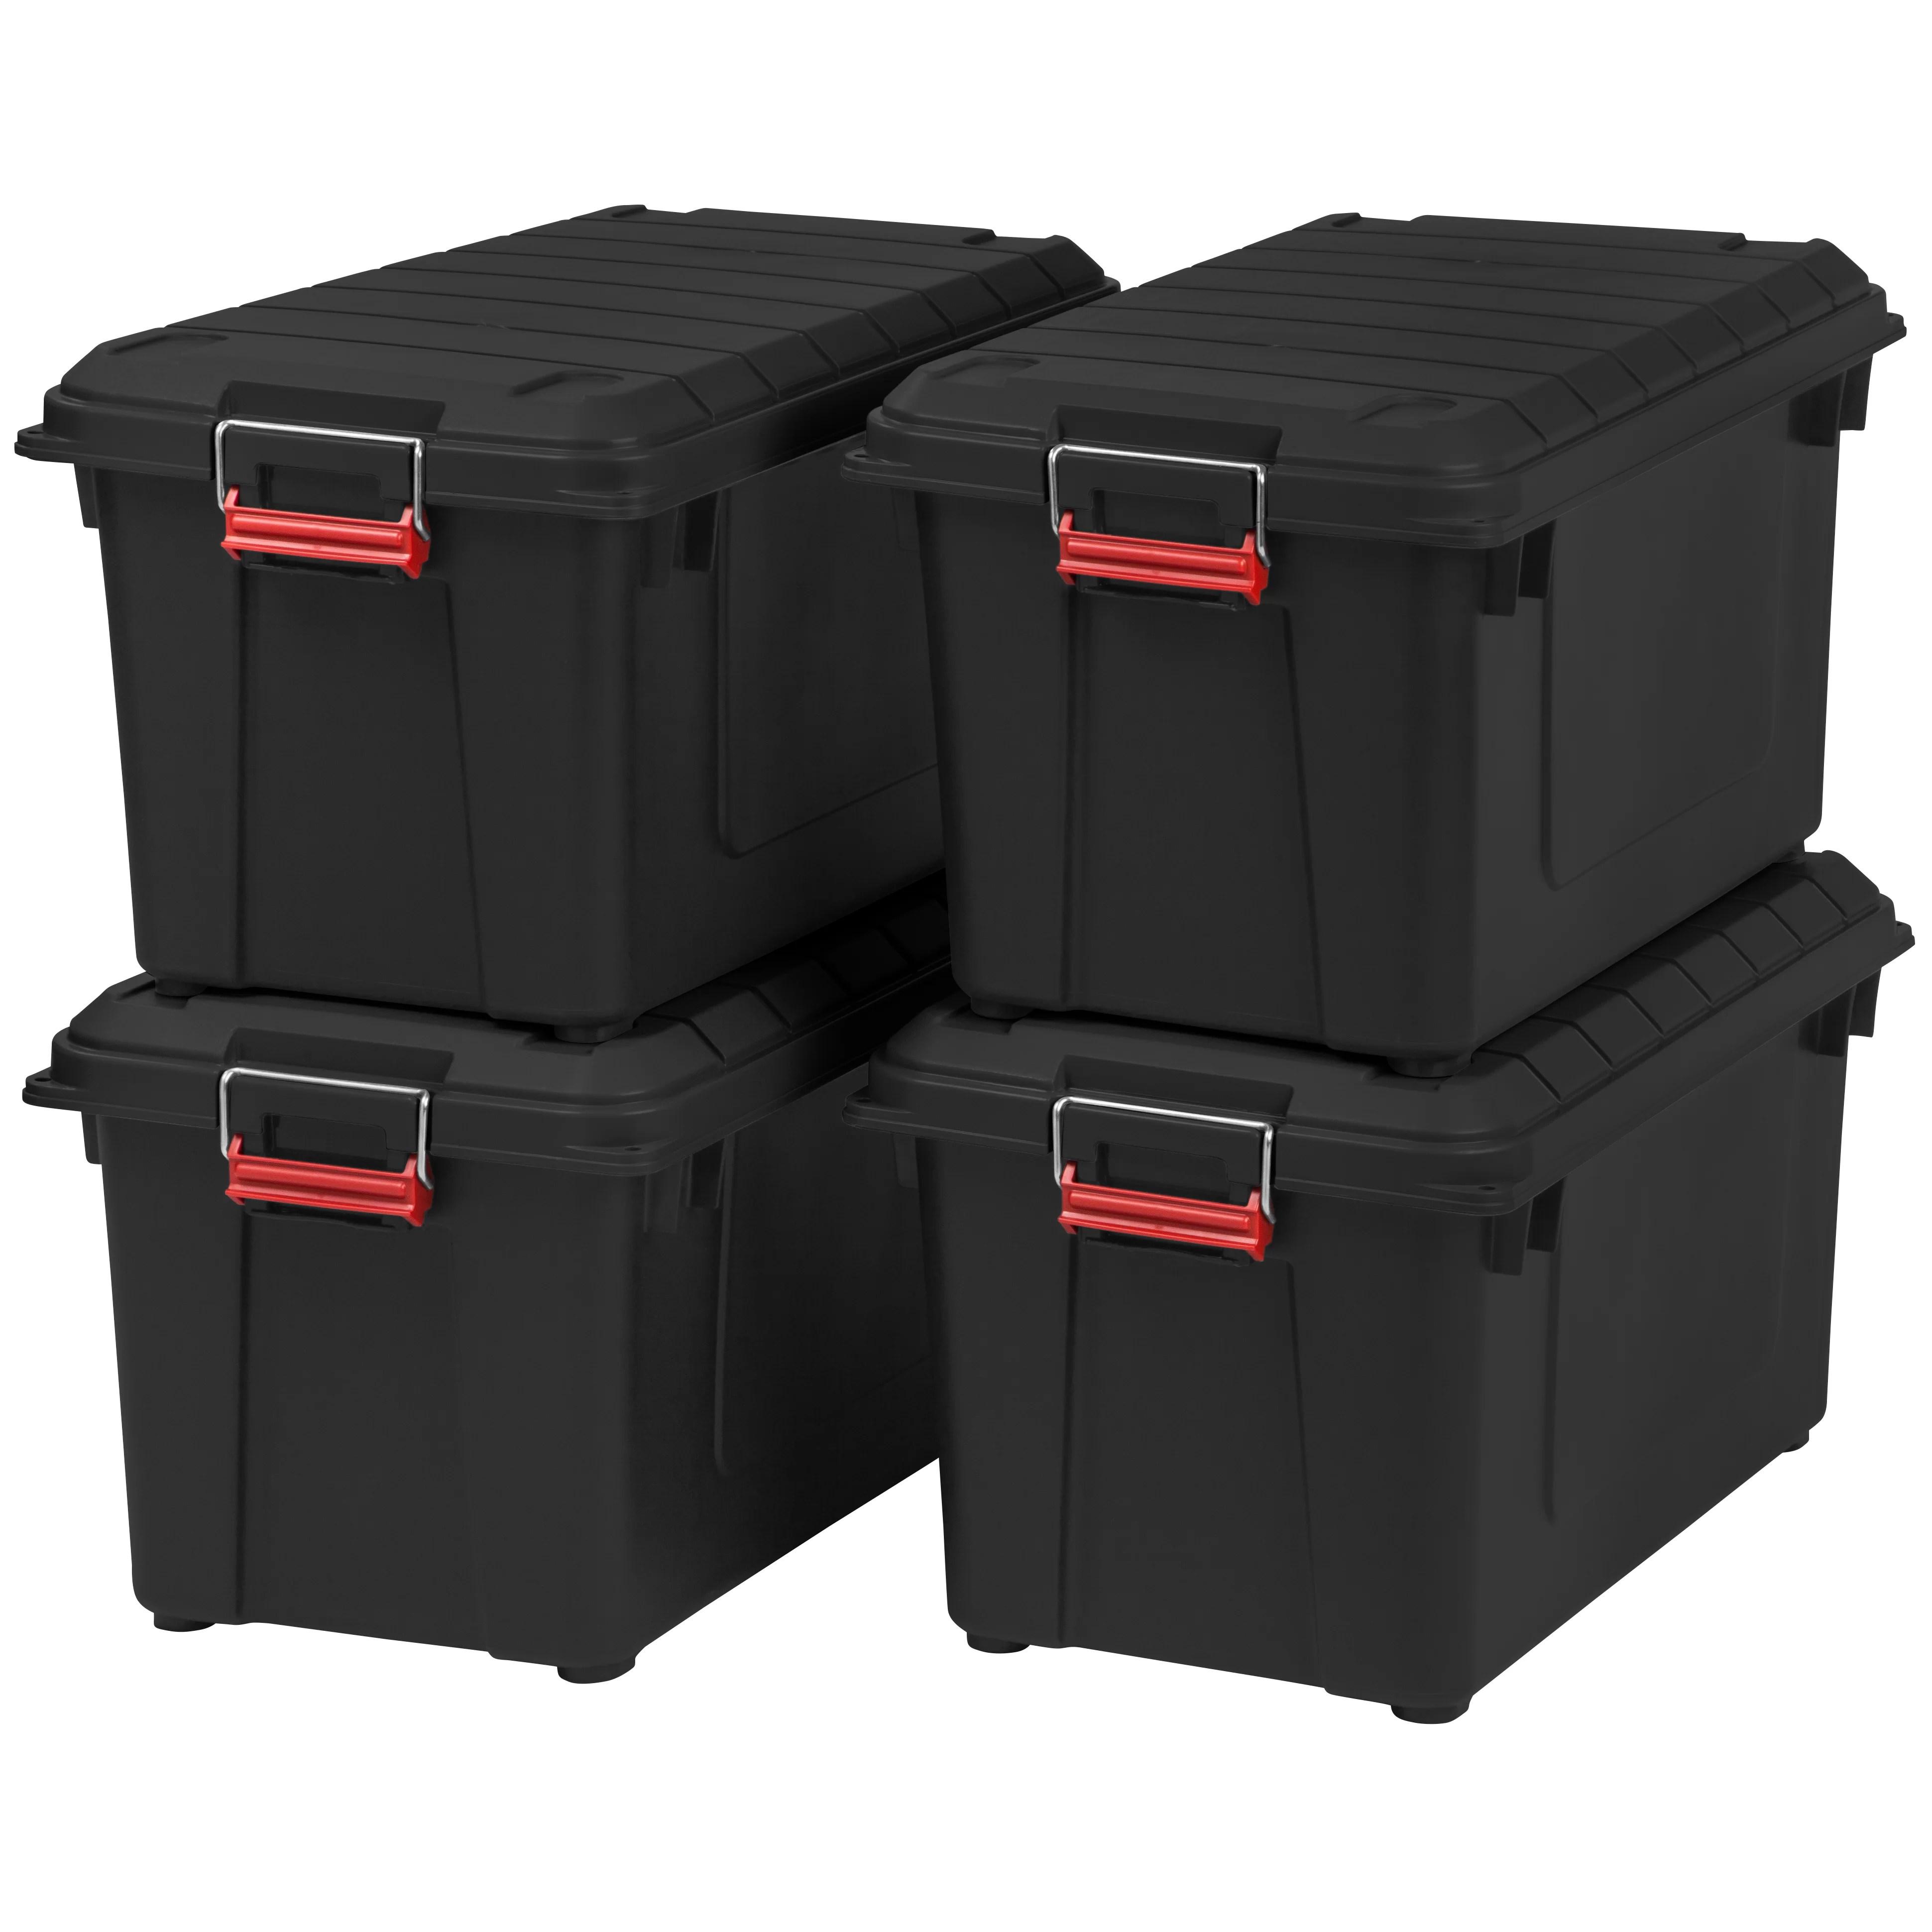 21 8 Gallon Weathertight Heavy Duty Storage Tote Wayfair